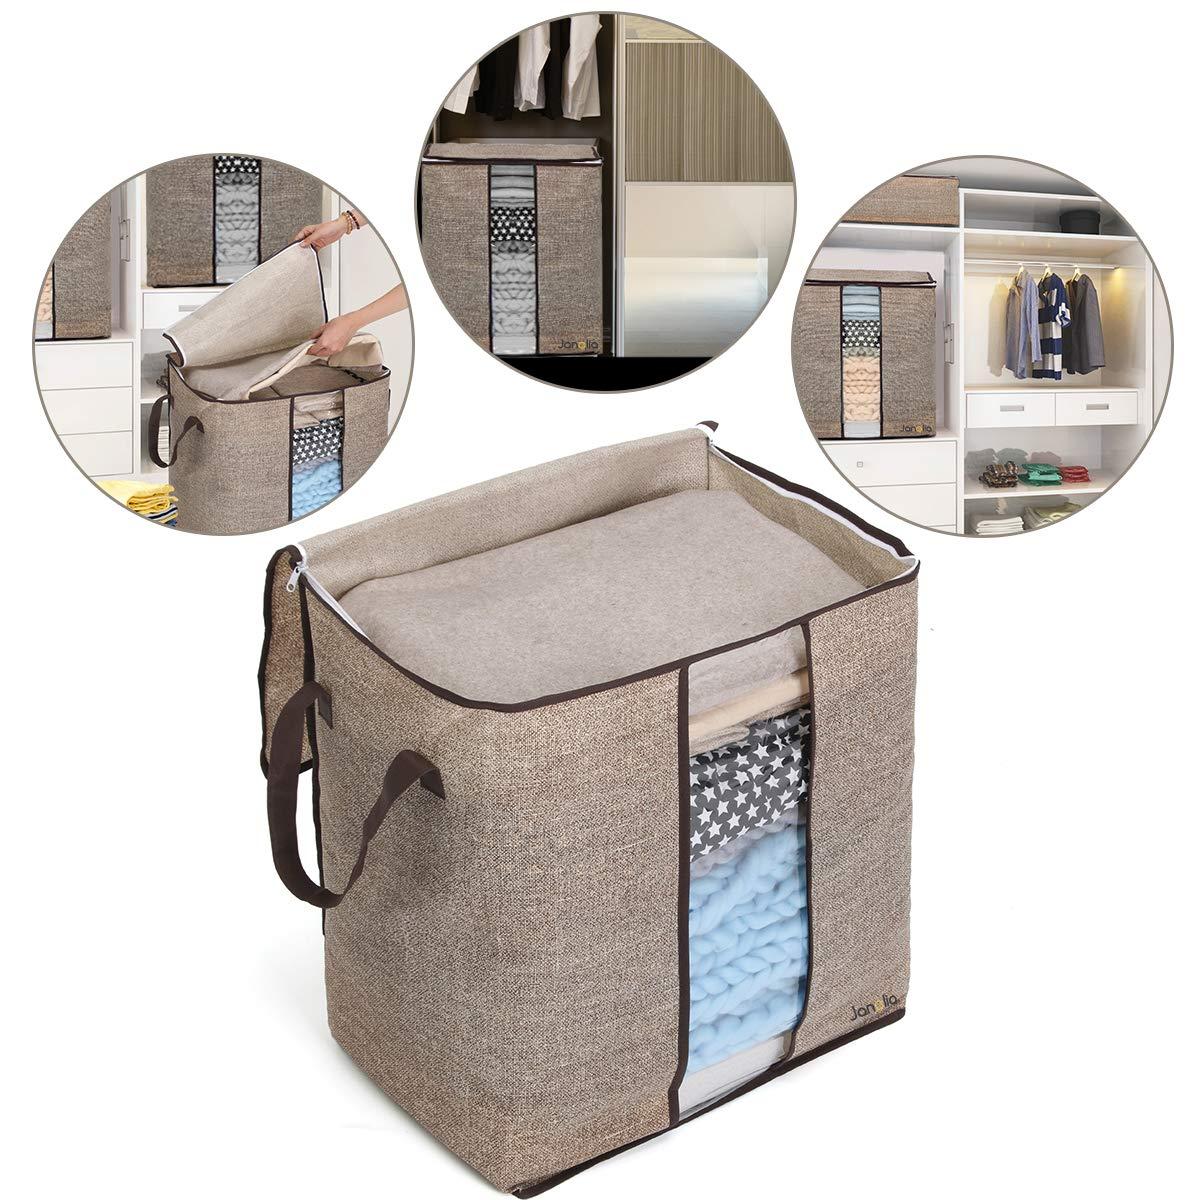 Janolia Caja para Armario, 67L Bolsa de ALmacenamiento, Bolsa Plegable, para Vestidos y